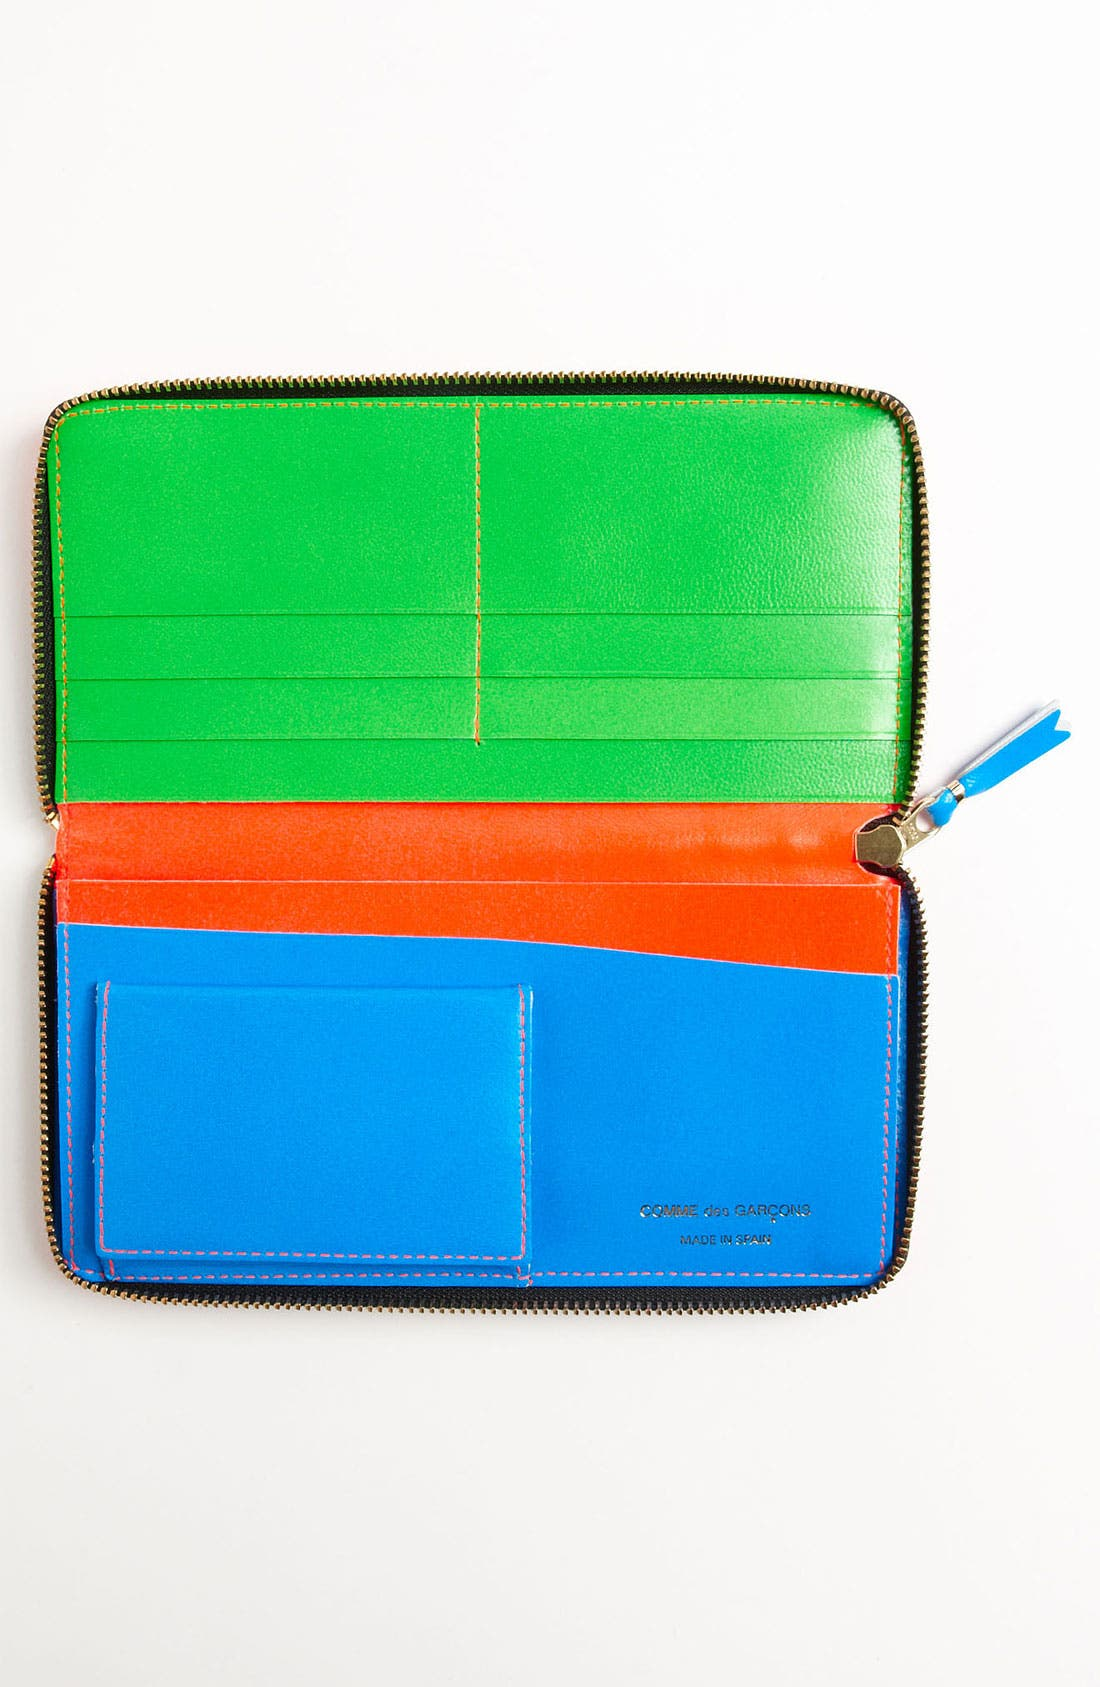 Alternate Image 3  - Comme des Garçons 'Super Fluo' Continental Wallet